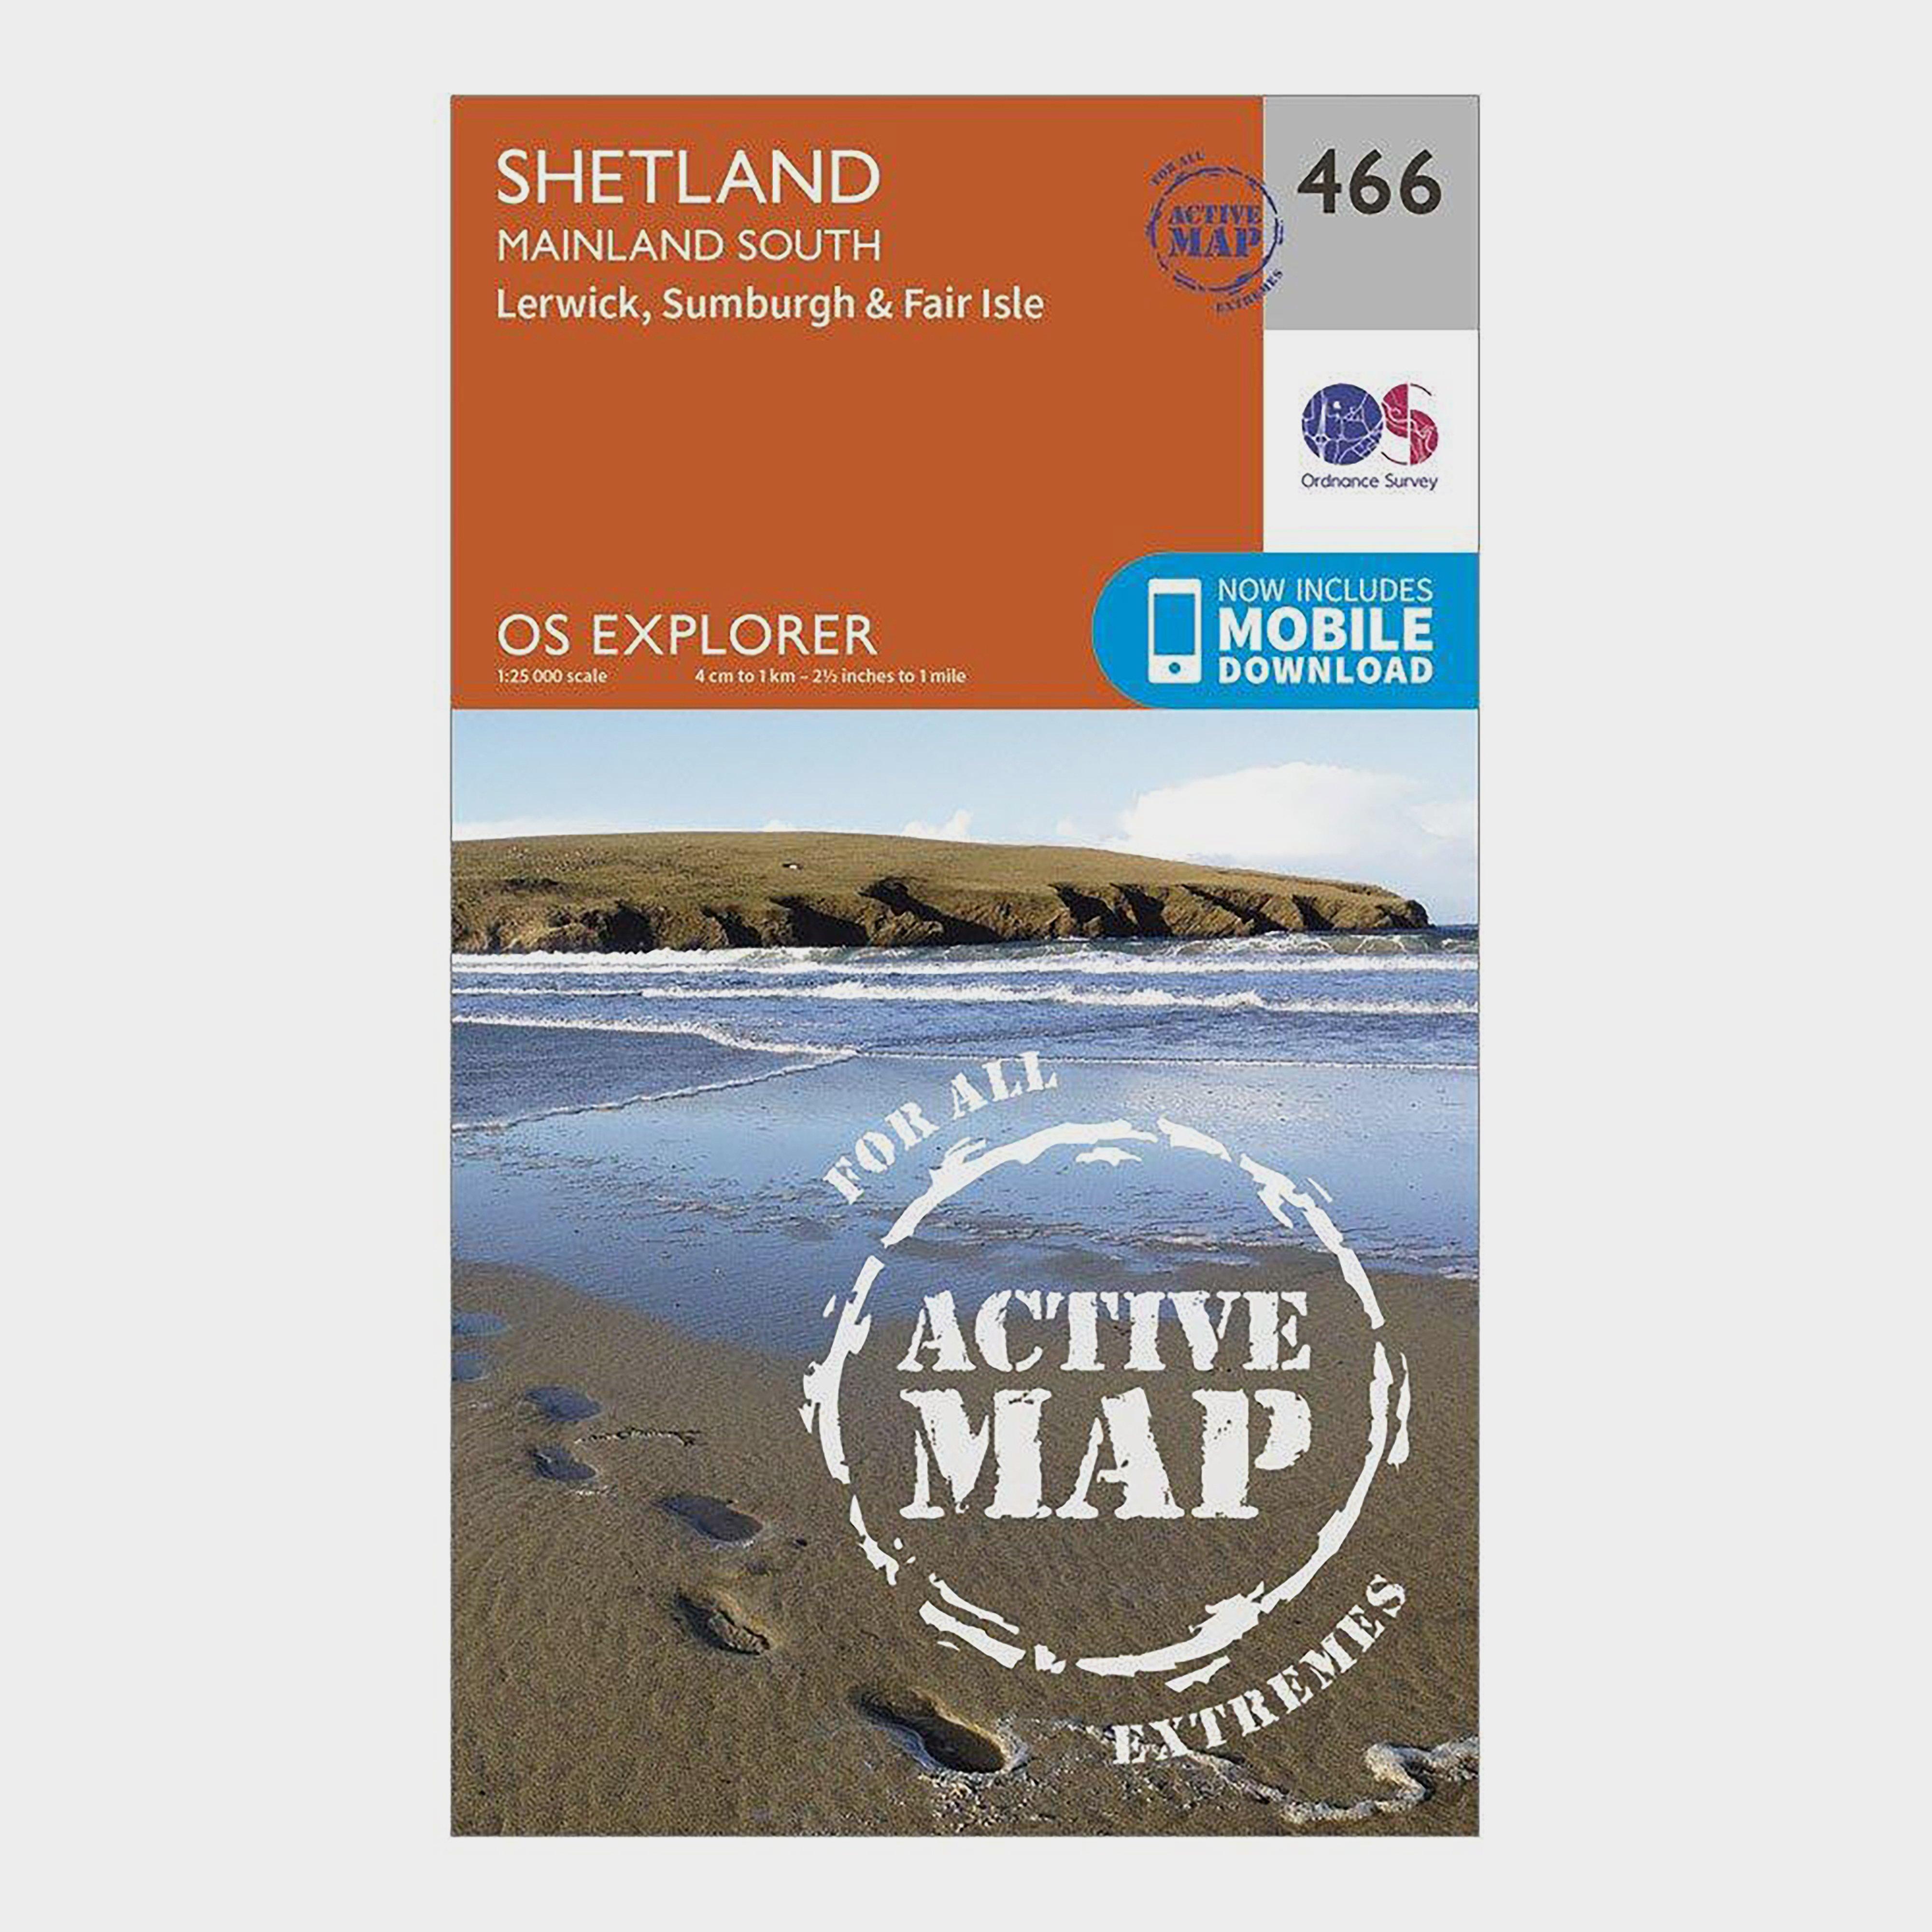 Image of Ordnance Survey Explorer Active 476 Shetland - Mainland South Map With Digital Version - D/D, D/D